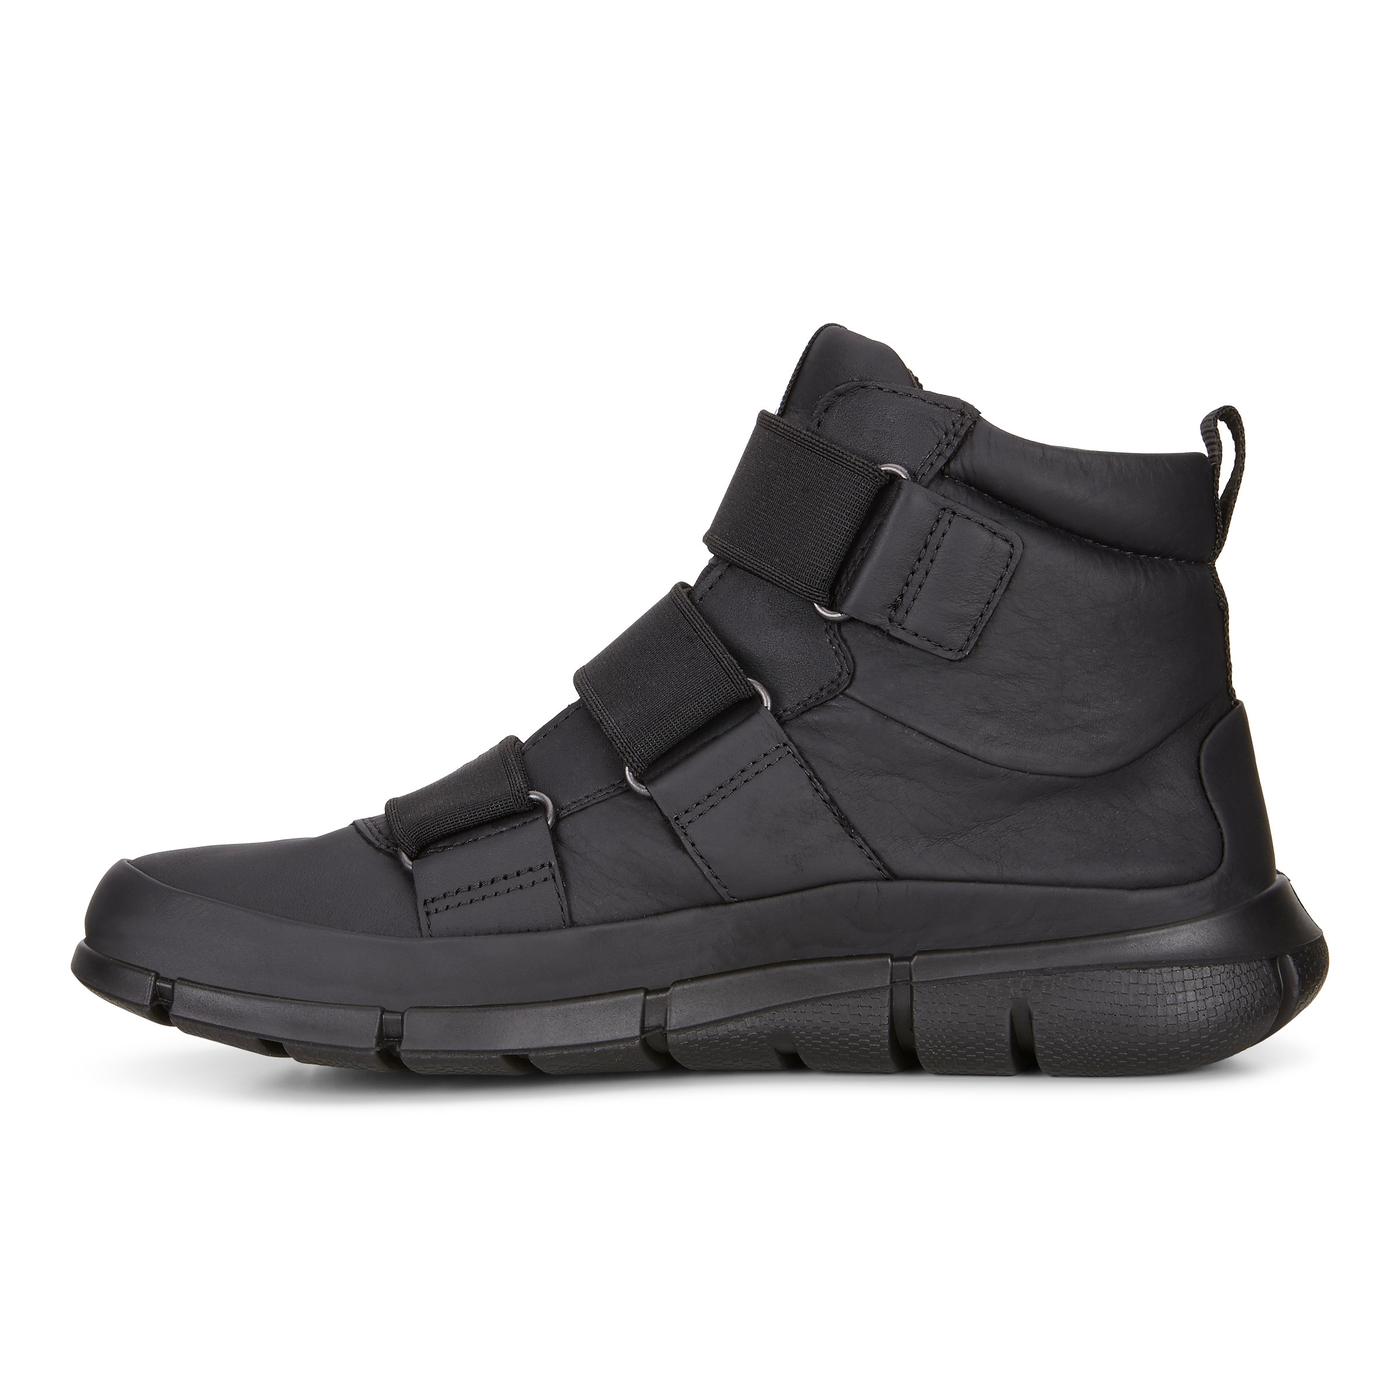 ECCO INTRINSIC1 Ladies Leather Boot